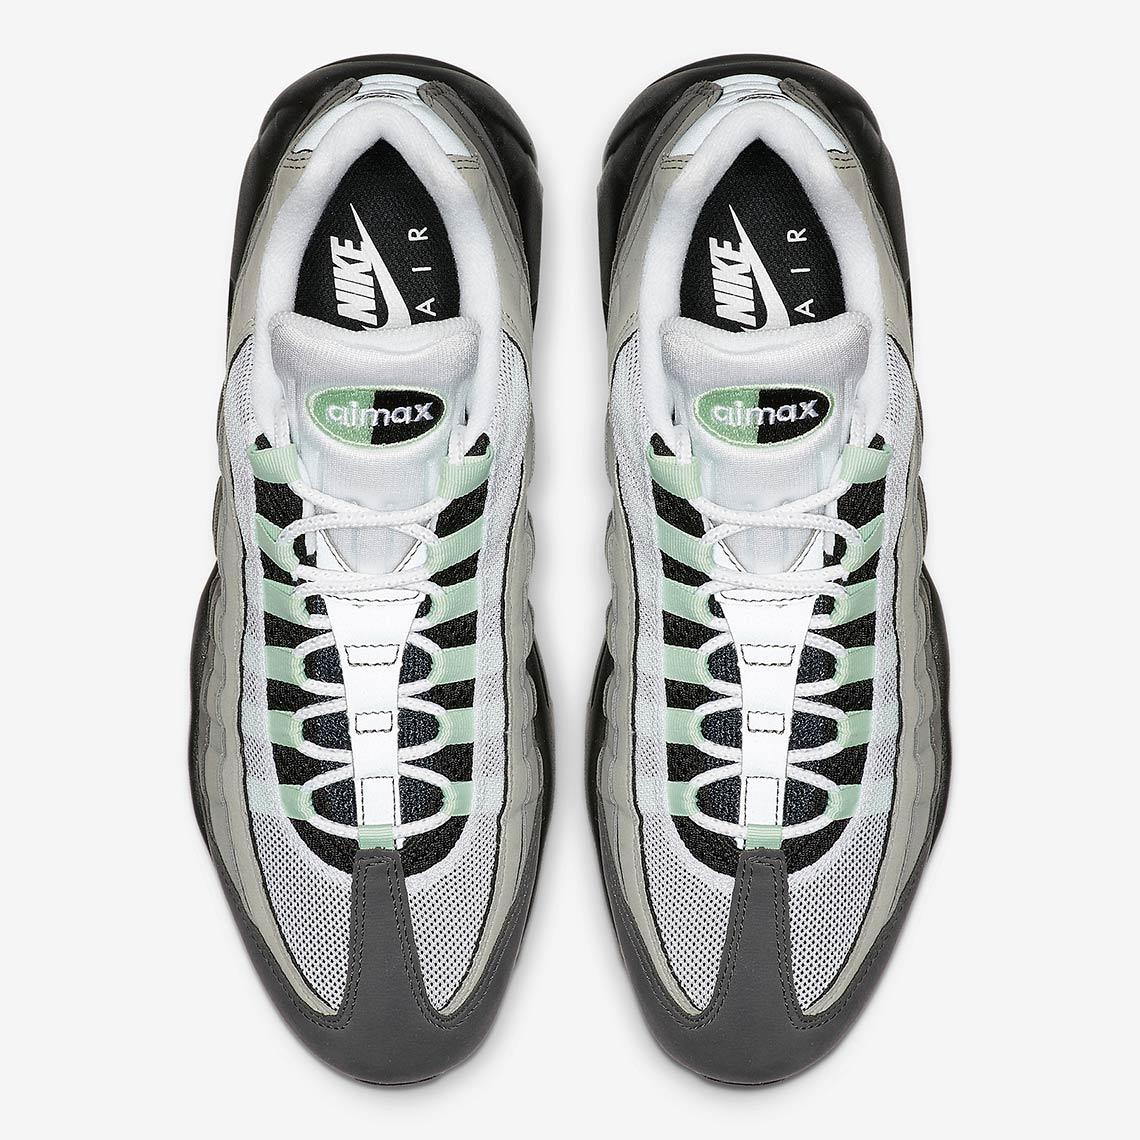 Nike Air Max 95 Mint CD7495-101 Release Date | SneakerNews.com